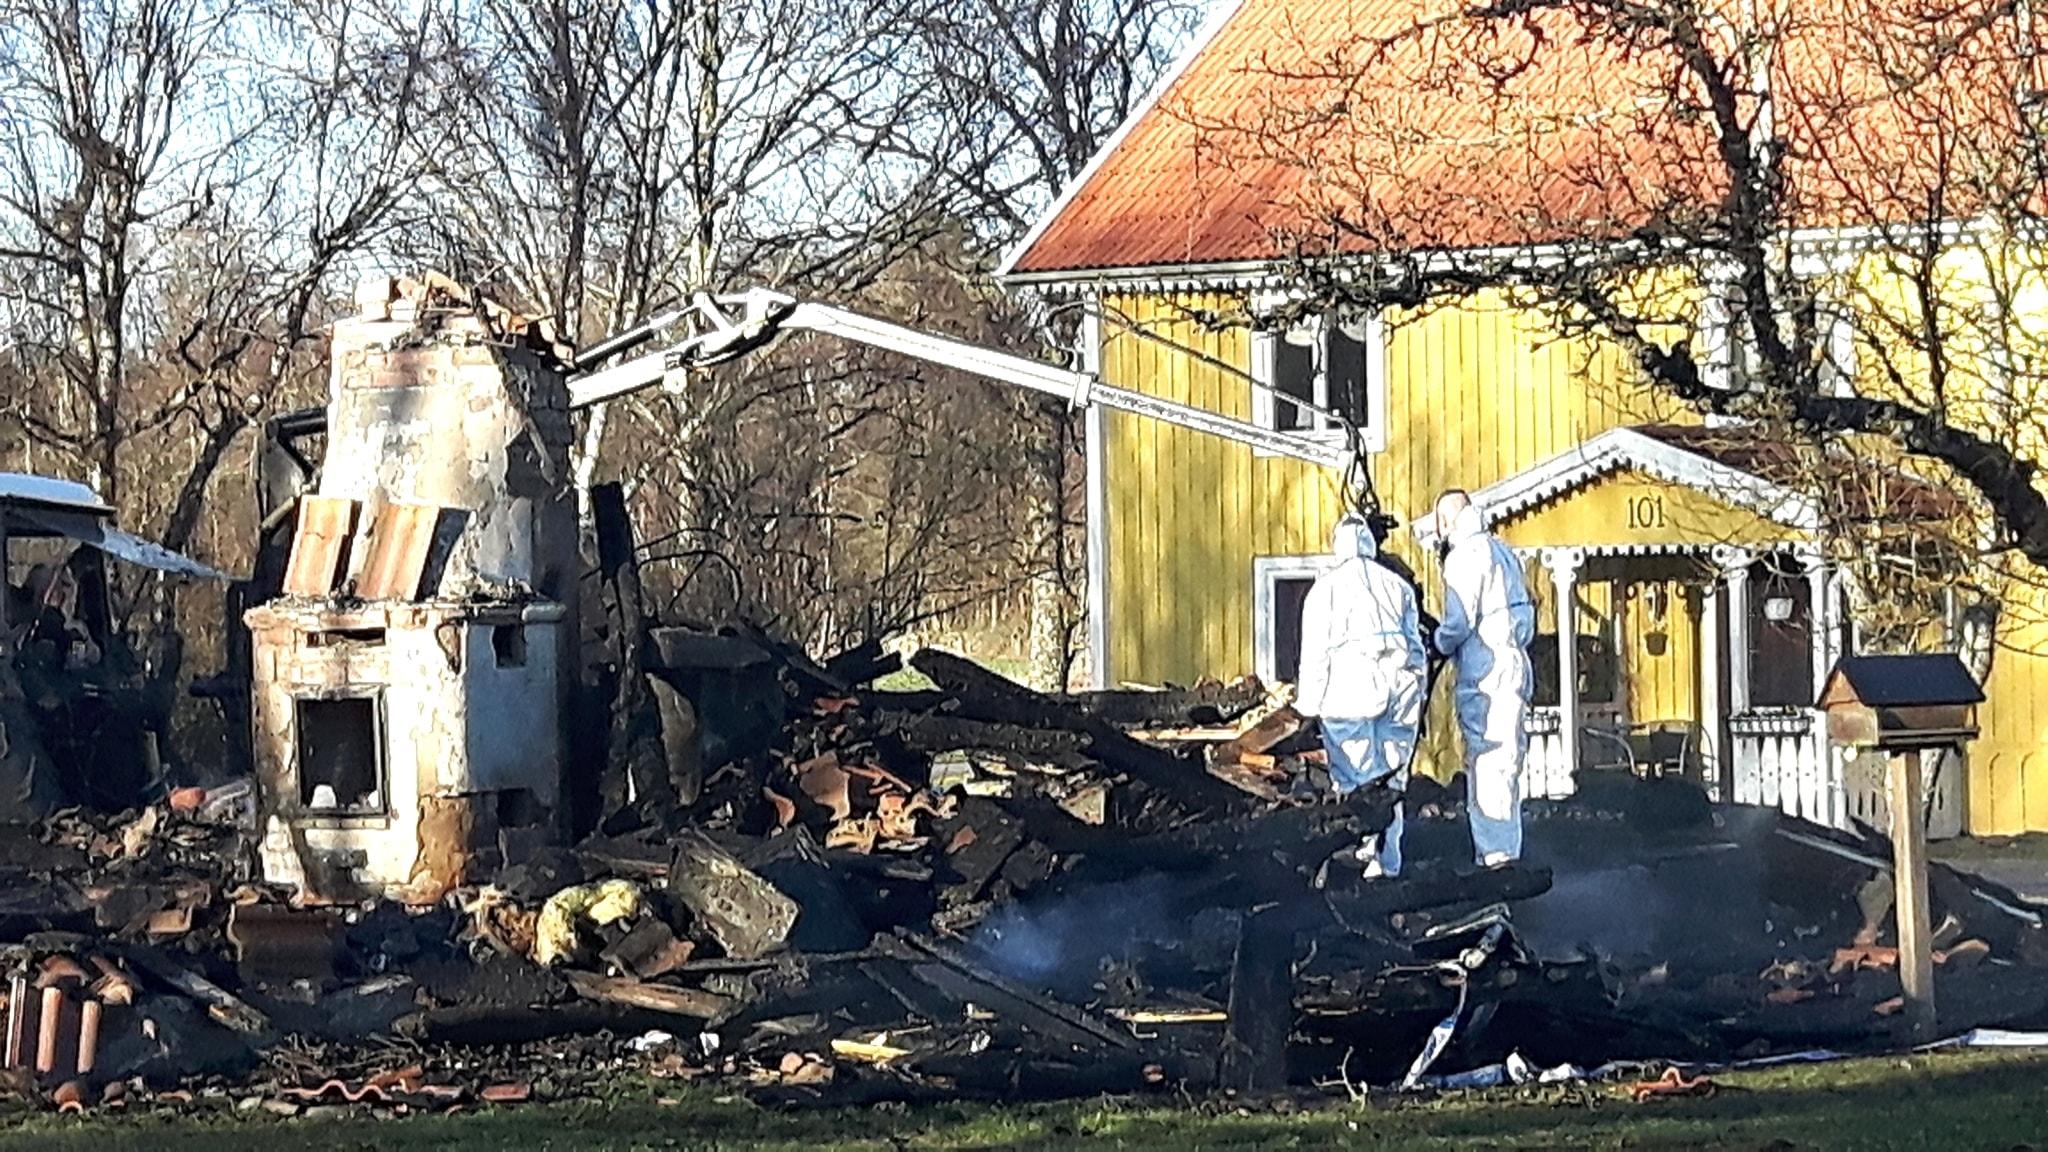 Skjul brann ner utanför Vimmerby P4 Kalmar | Sveriges Radio